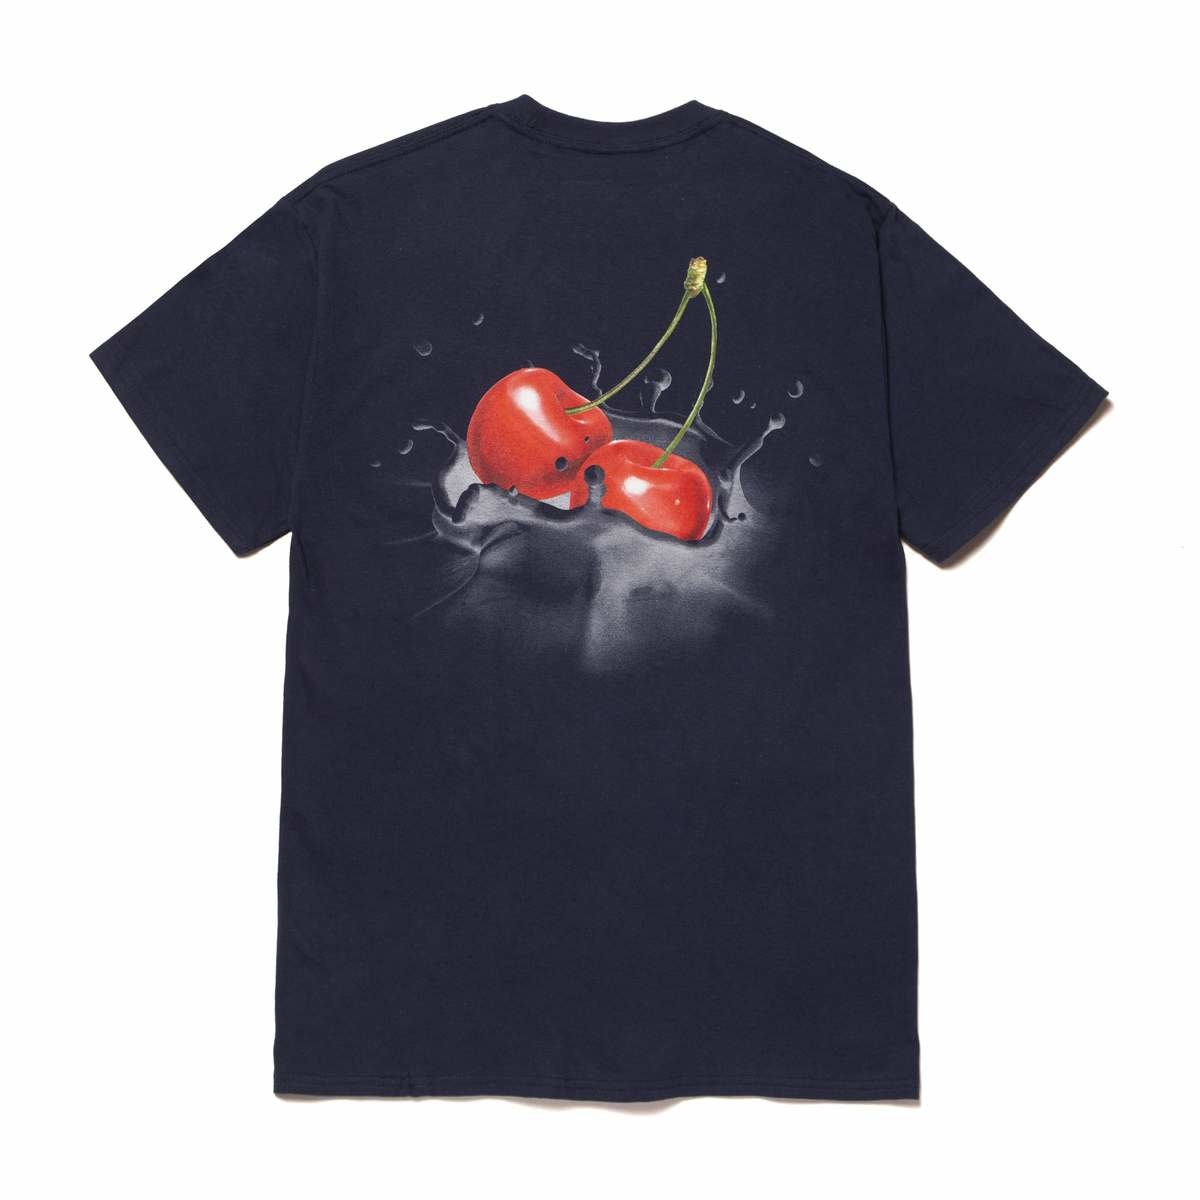 HUF Wet Cherry Navy